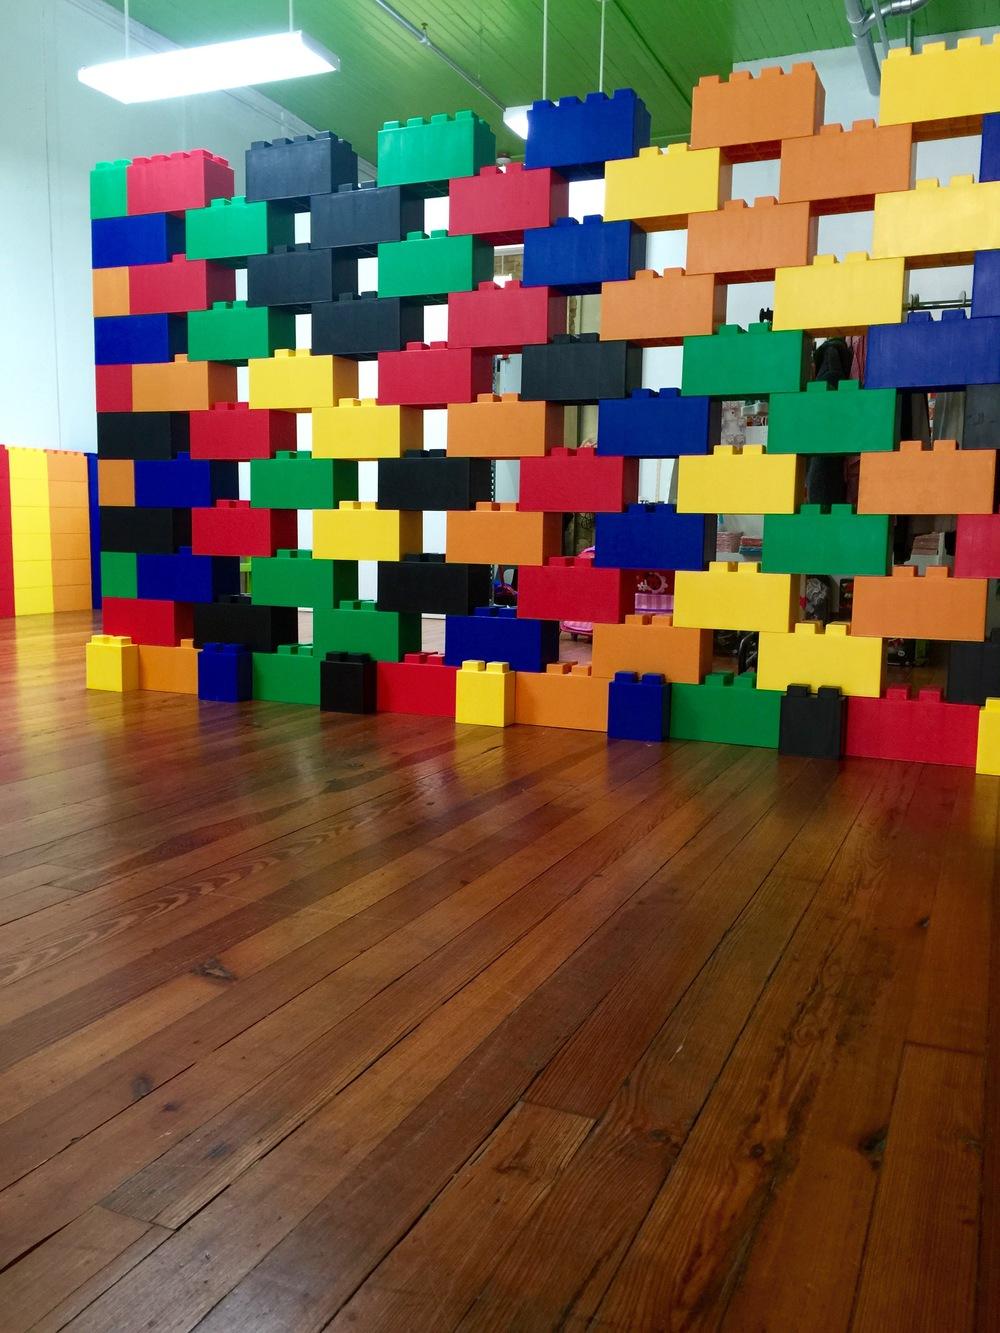 Interlocking walls